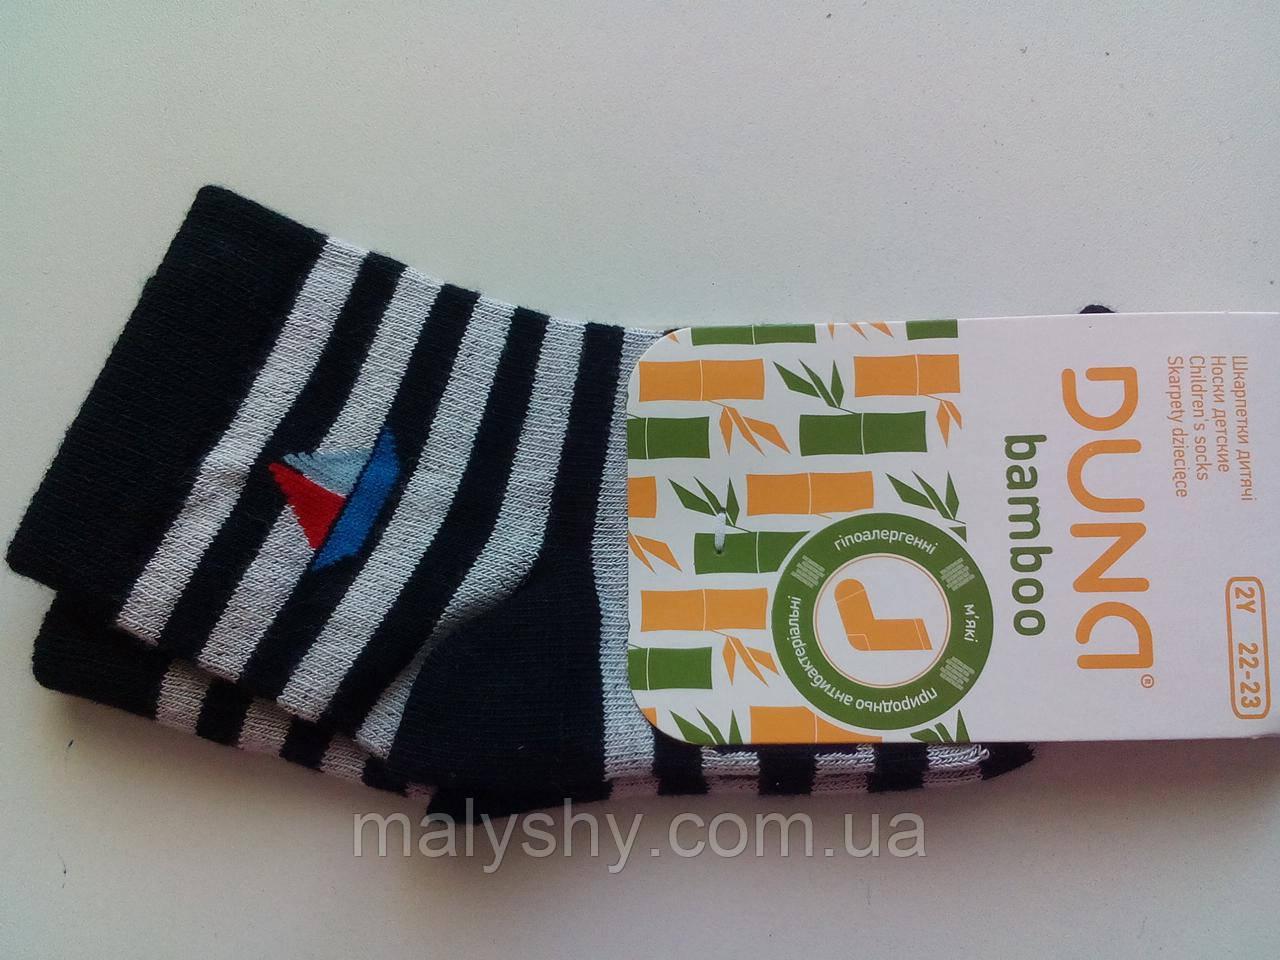 Детские носки демисезонные - Дюна р.14-16 (шкарпетки дитячі) 416-1506-темно-синий